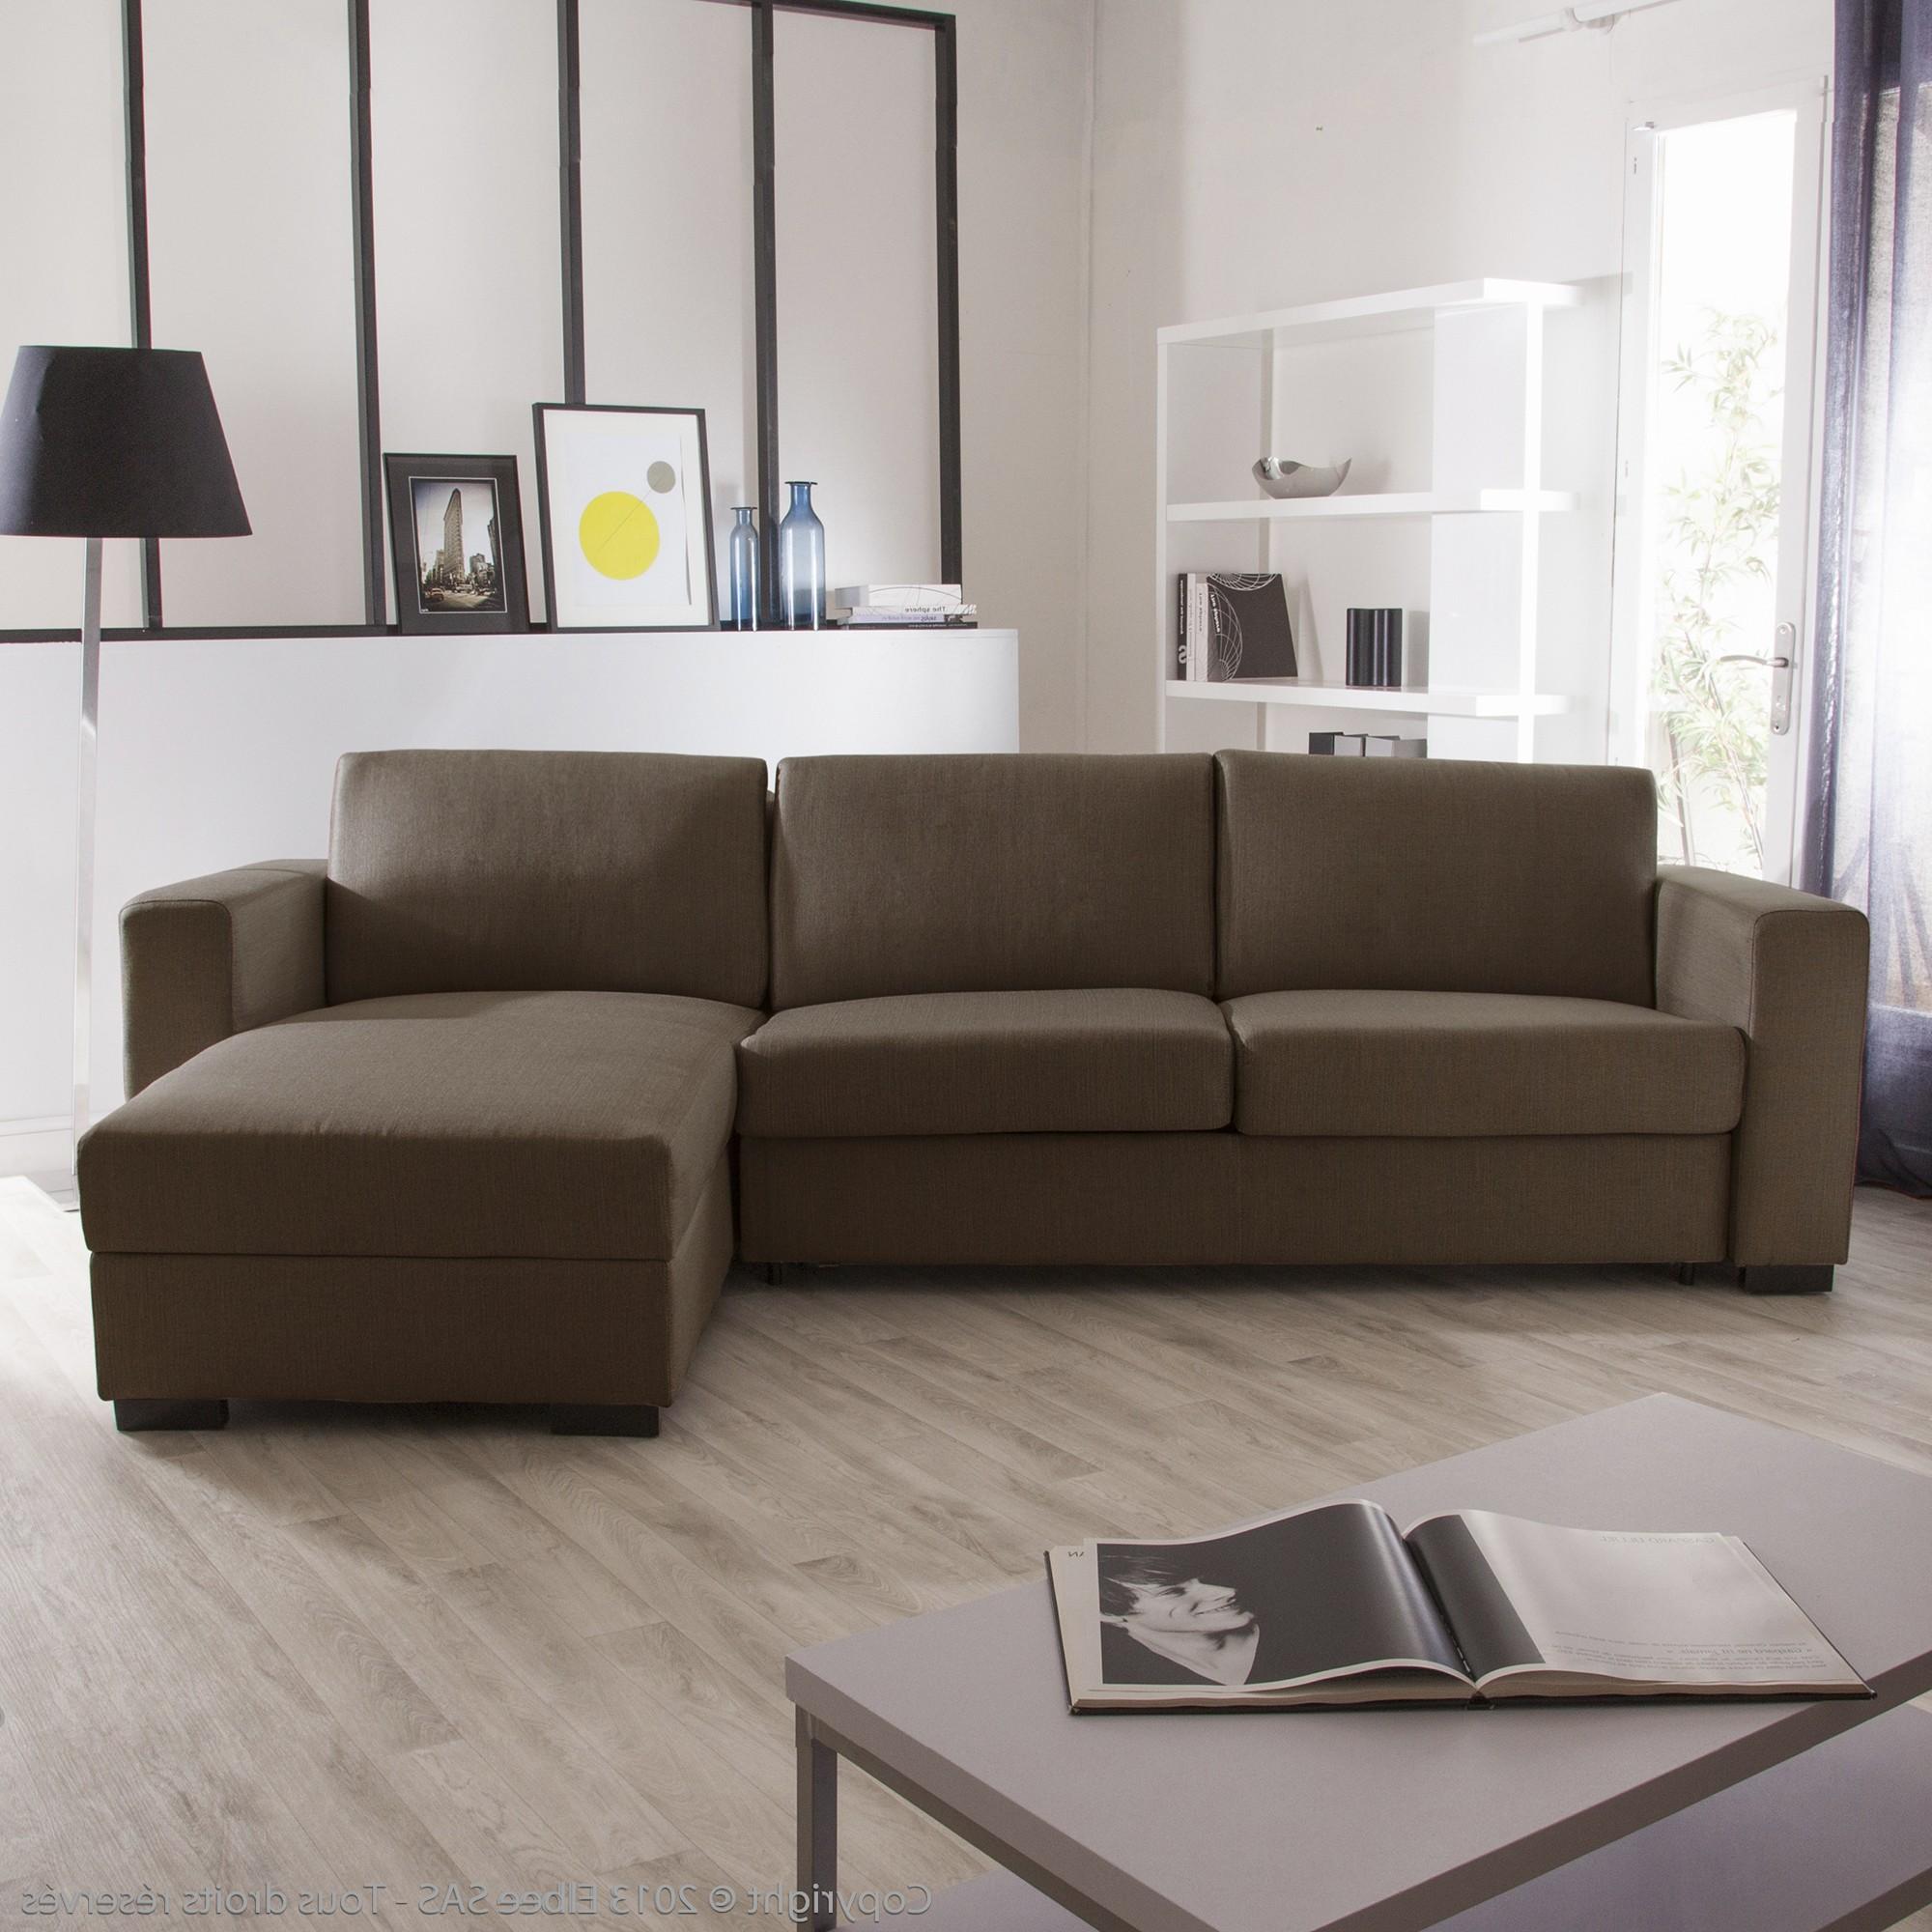 Canapé D'angle Convertible Tissu Beige